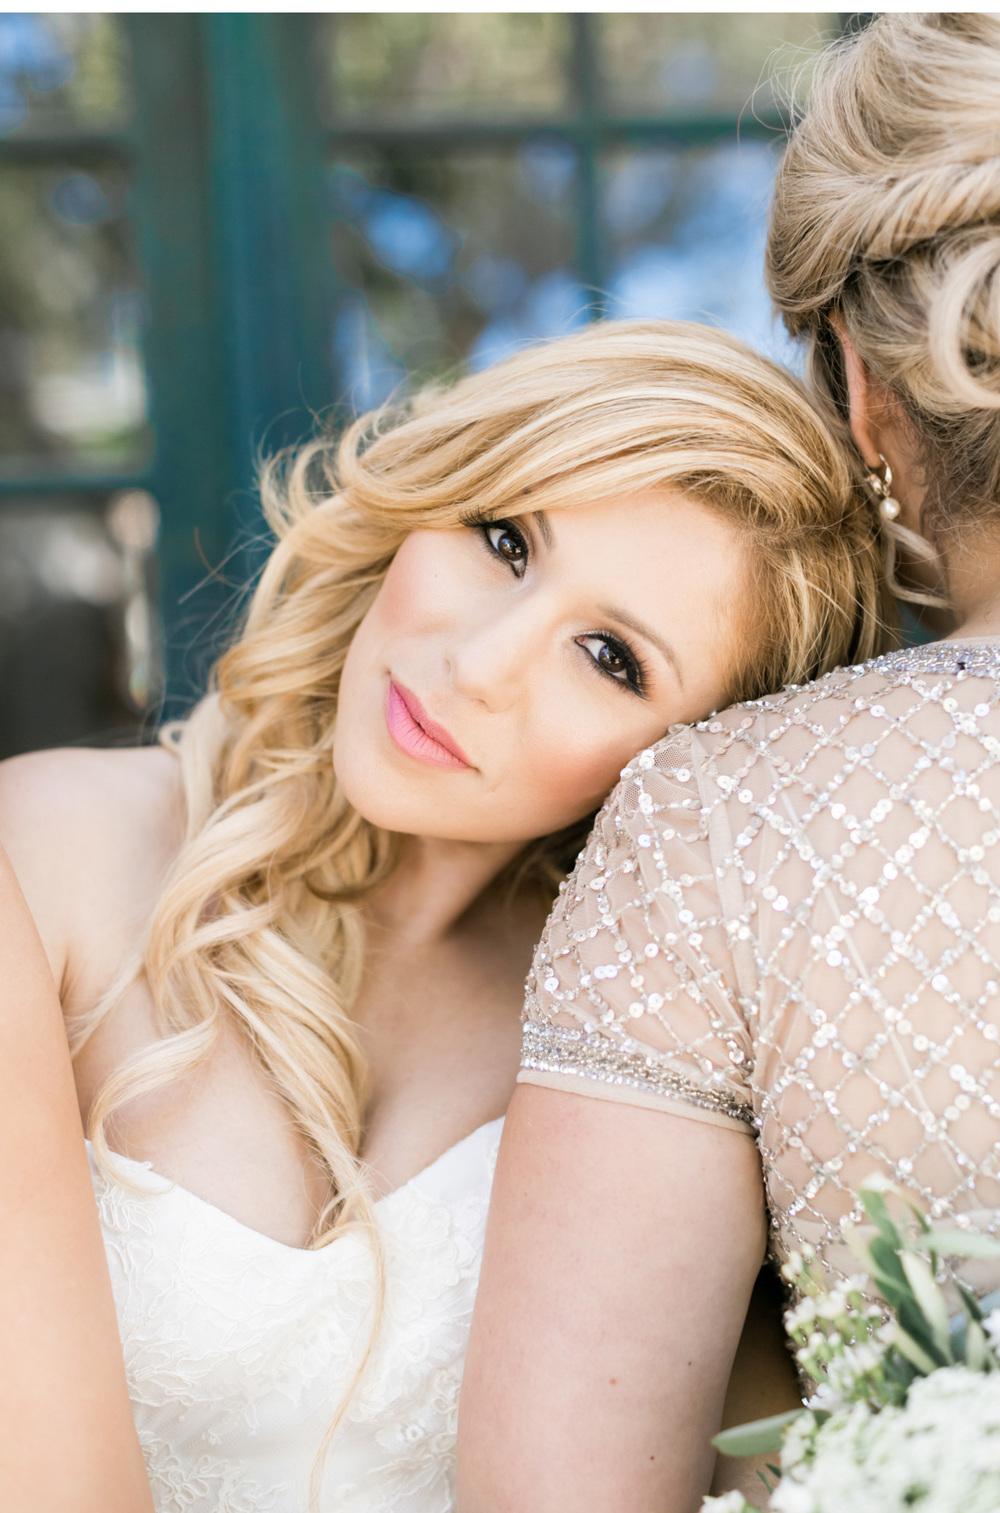 Style-Me-Pretty-Mission-San-Juan-Capistrano-Wedding-Natalie-Schutt-Photography_02.jpg